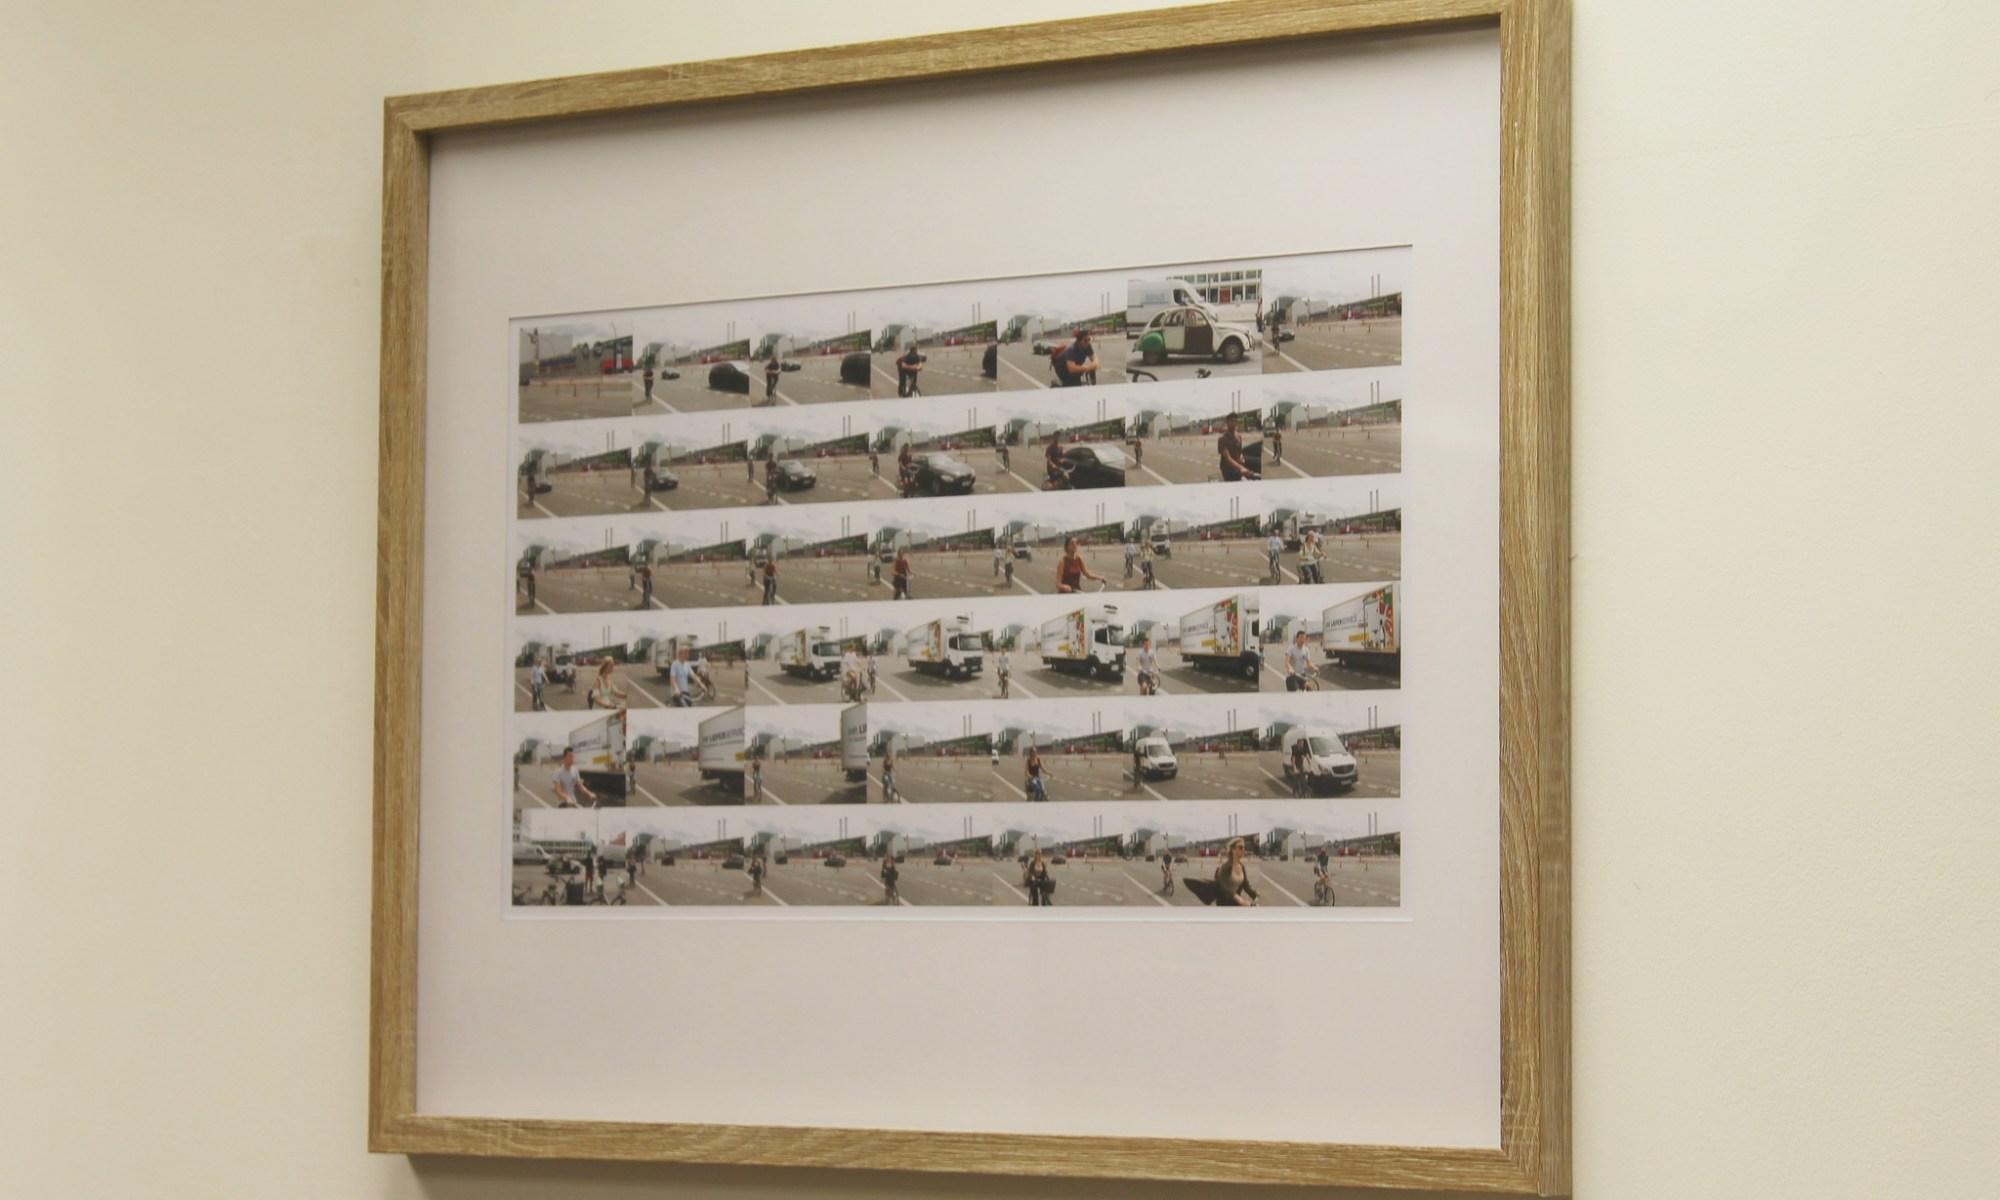 Tom Neill - Berlin Cyclists framed print